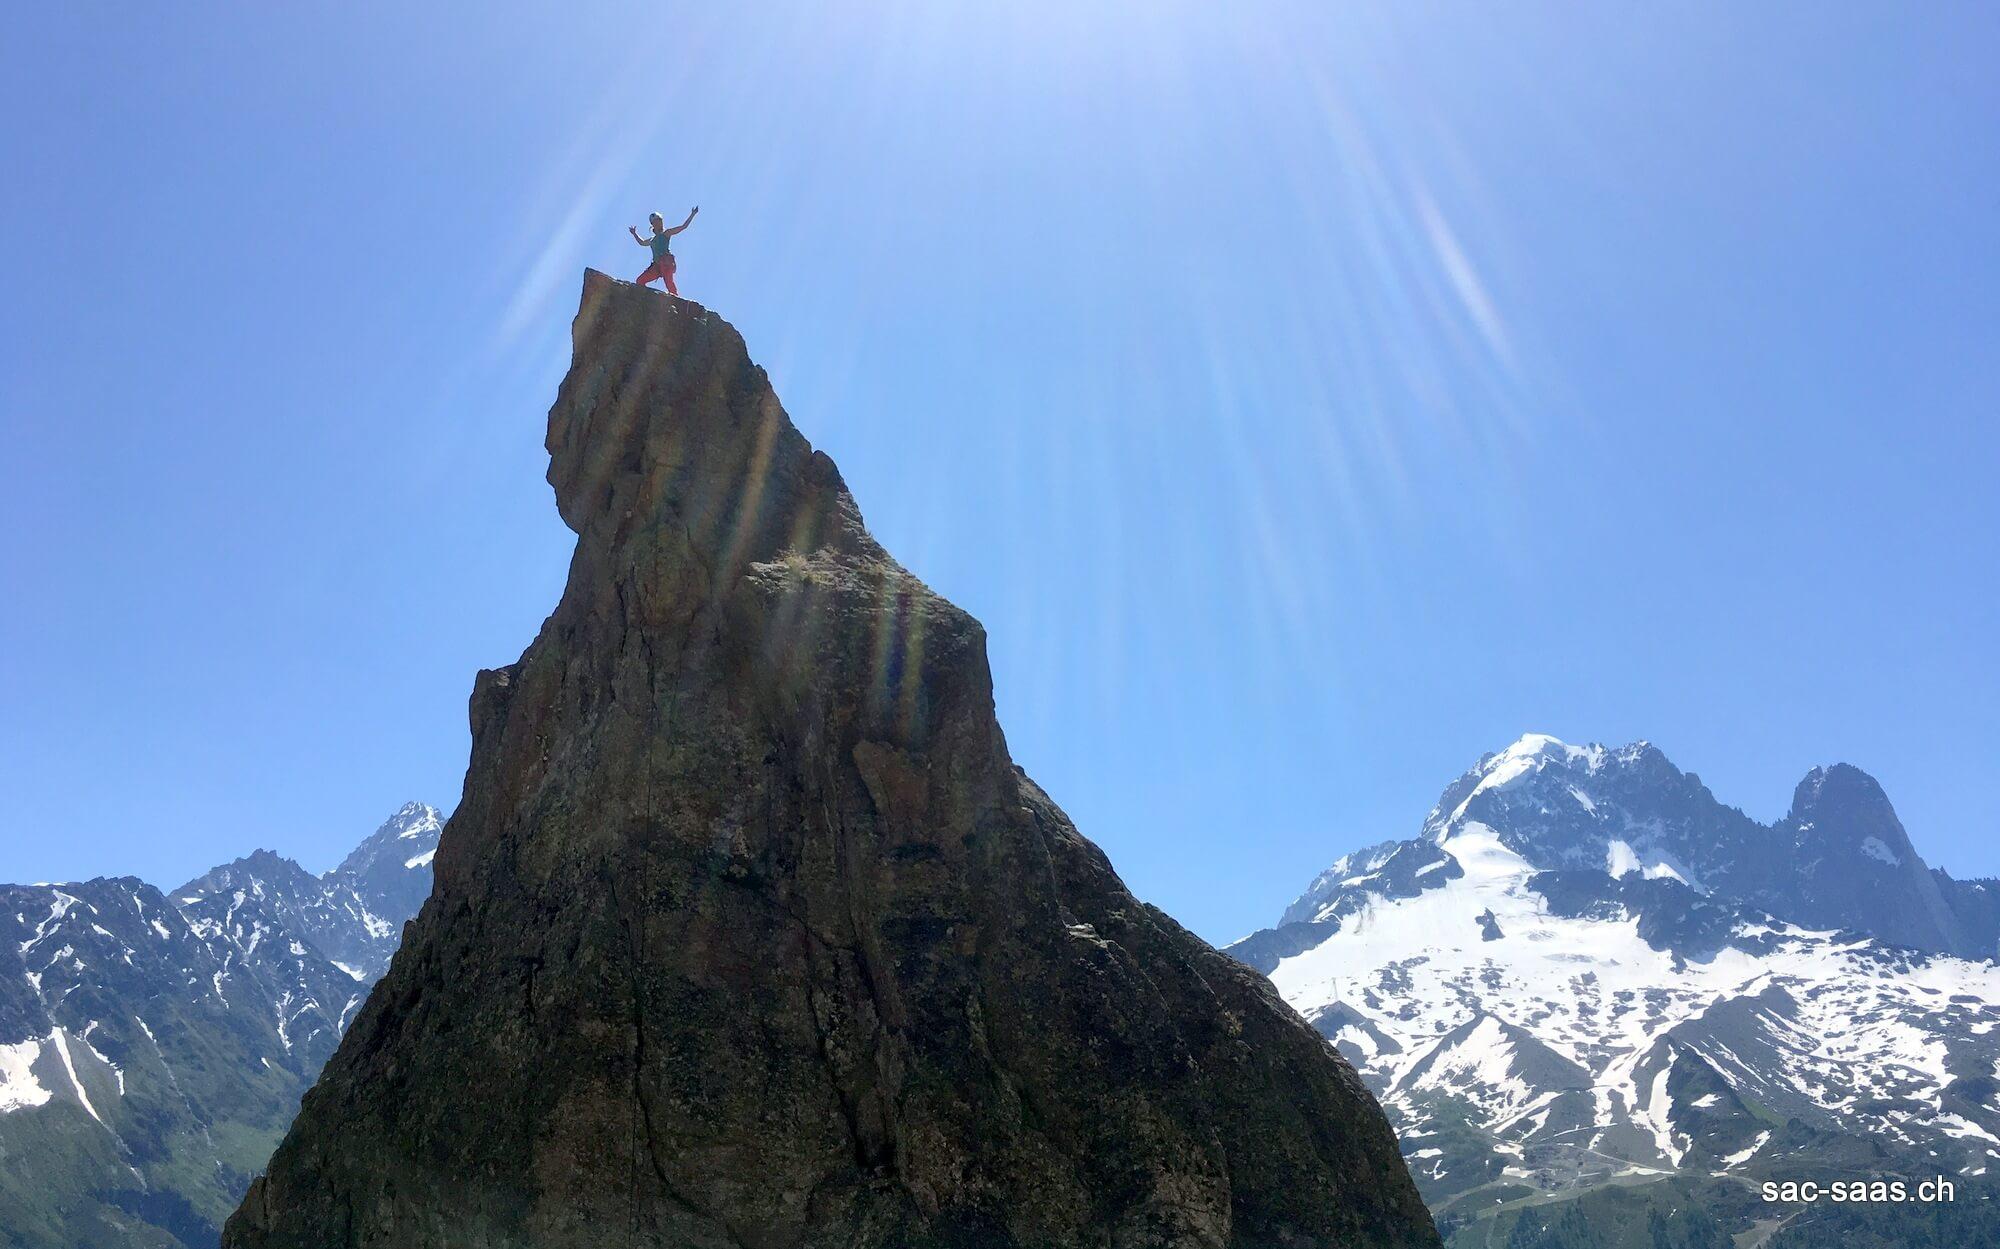 Klettersteig Chamonix : Klettern in chamonix u sac saas